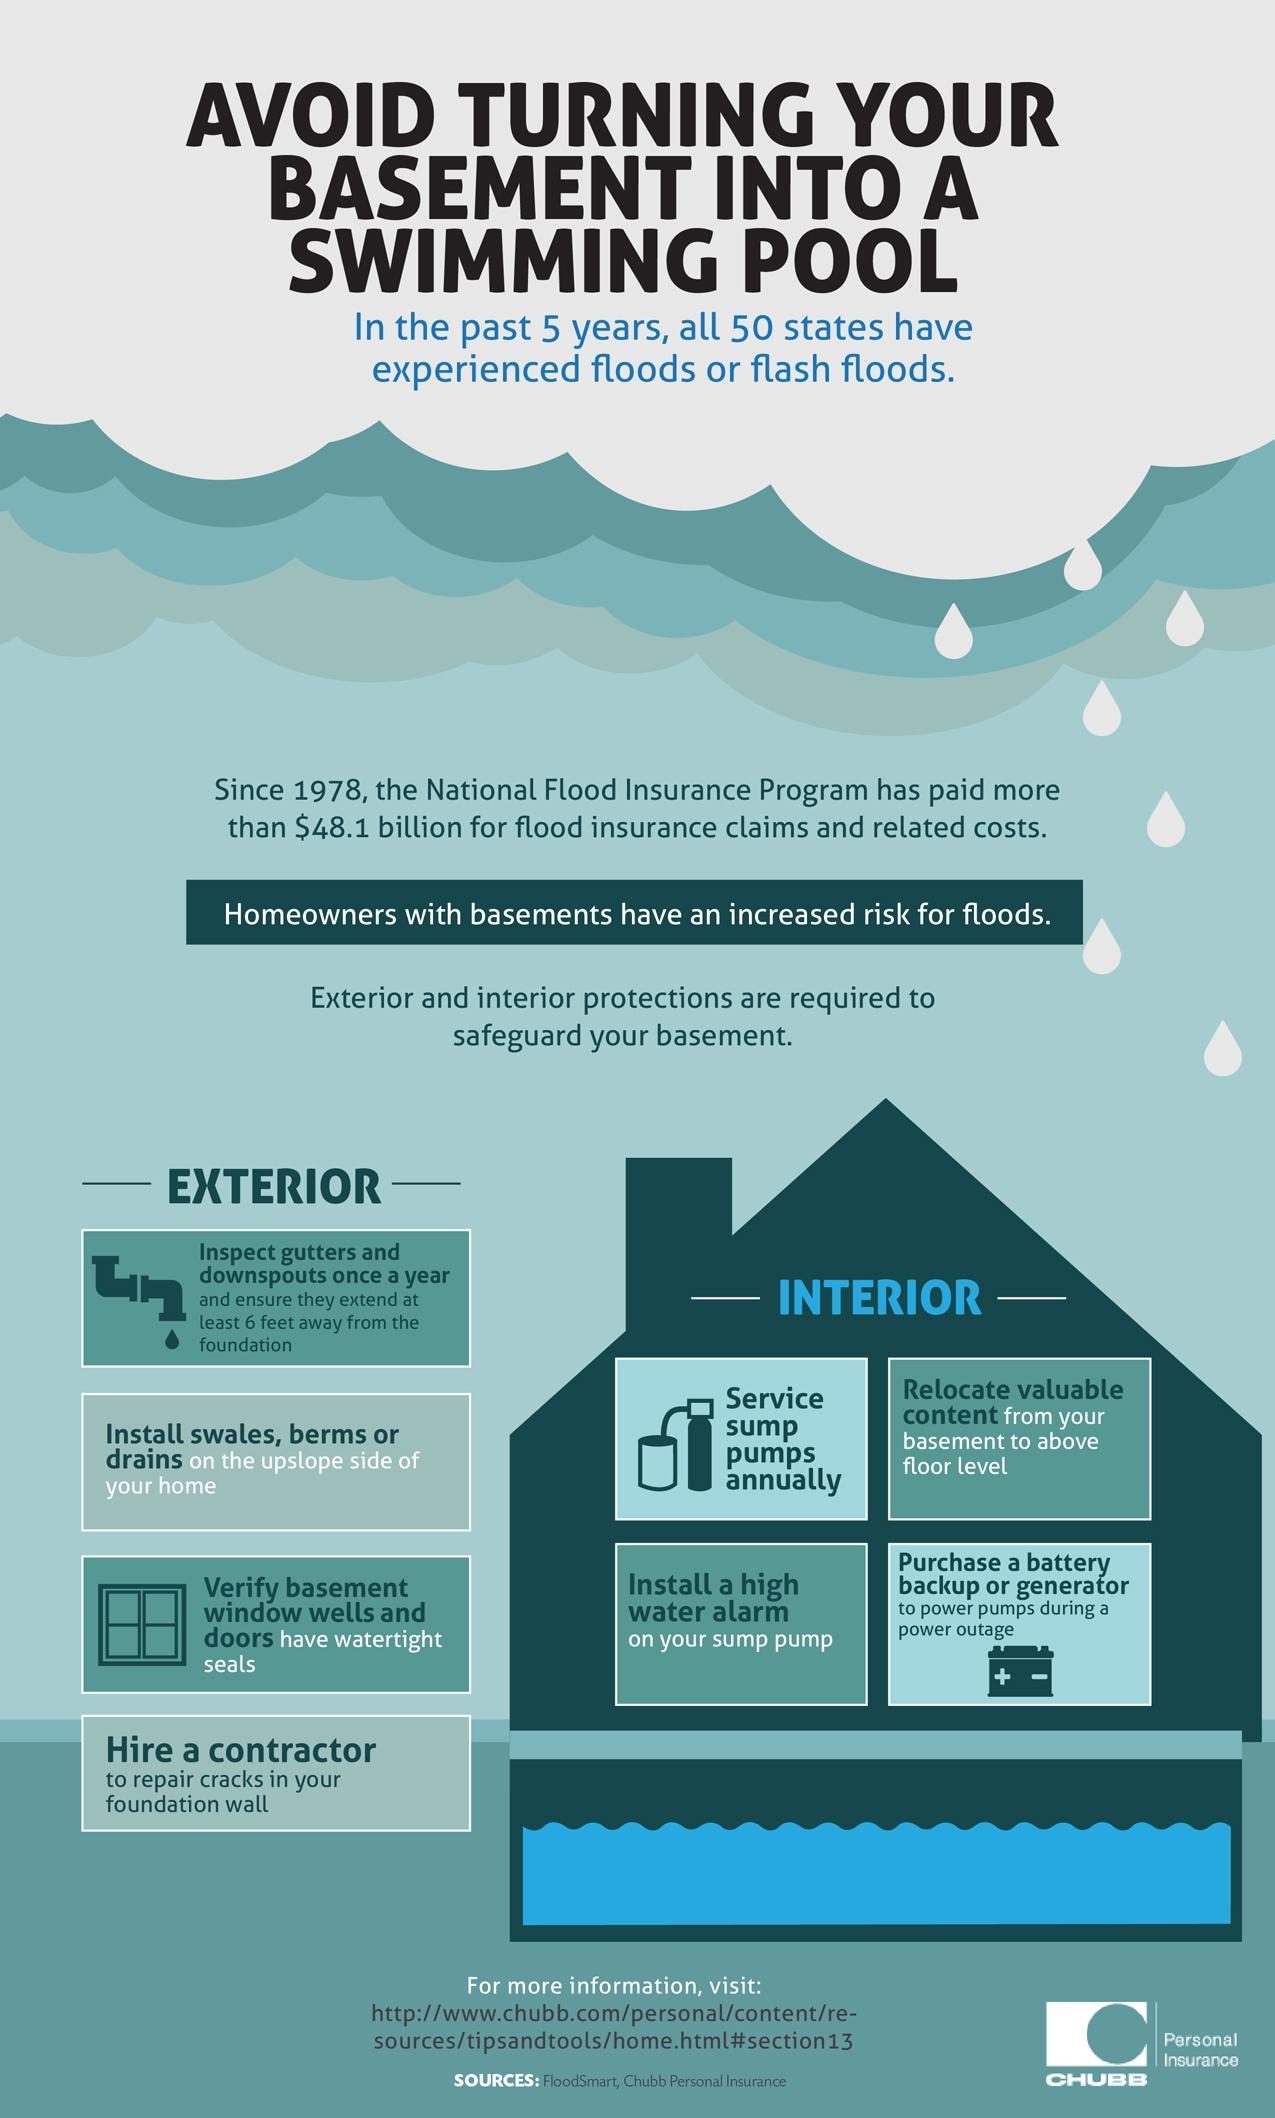 Ways To Prevent Basement Flooding